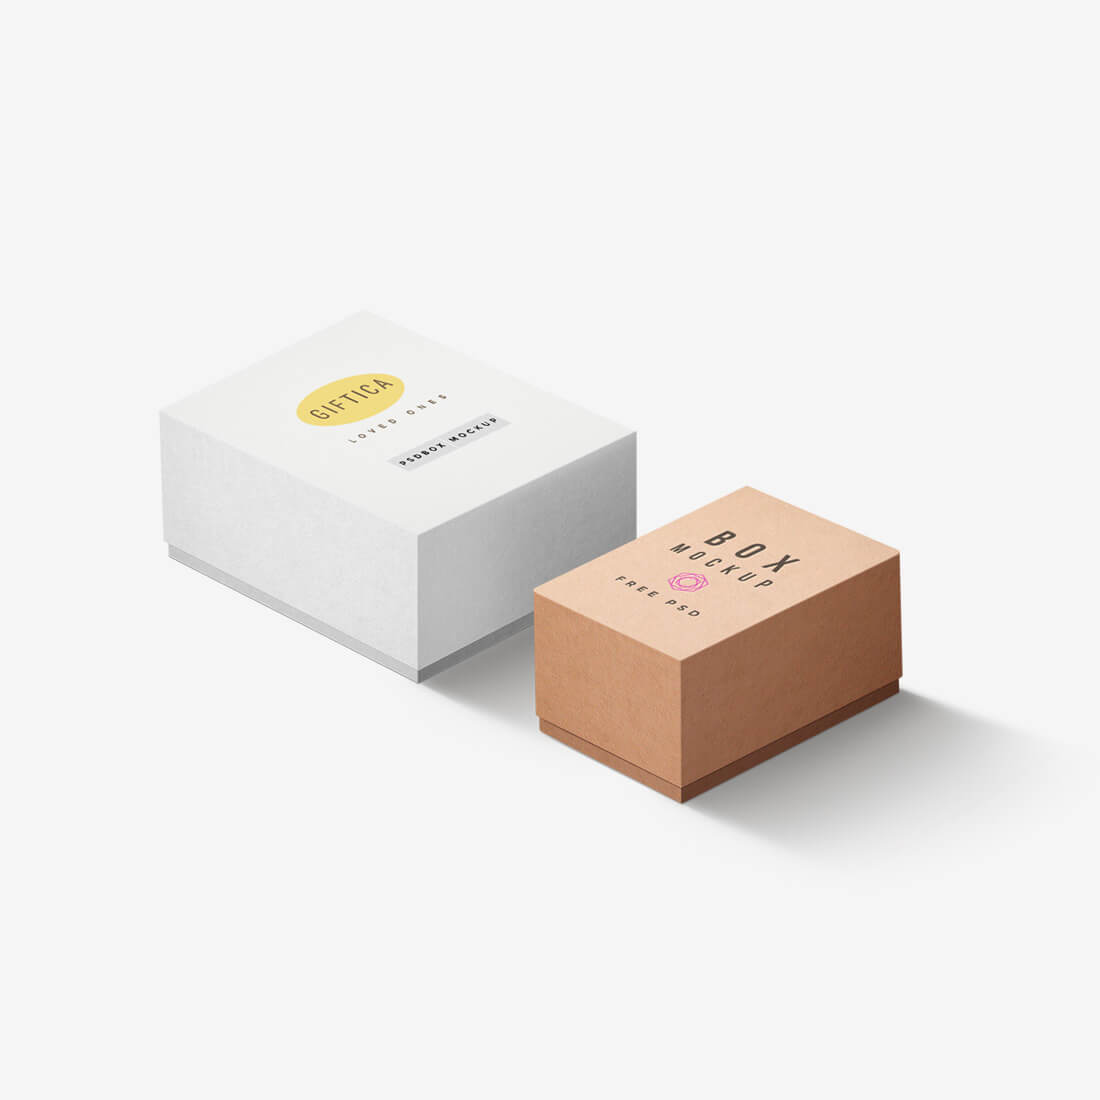 portfolio5square - طراحی محصول